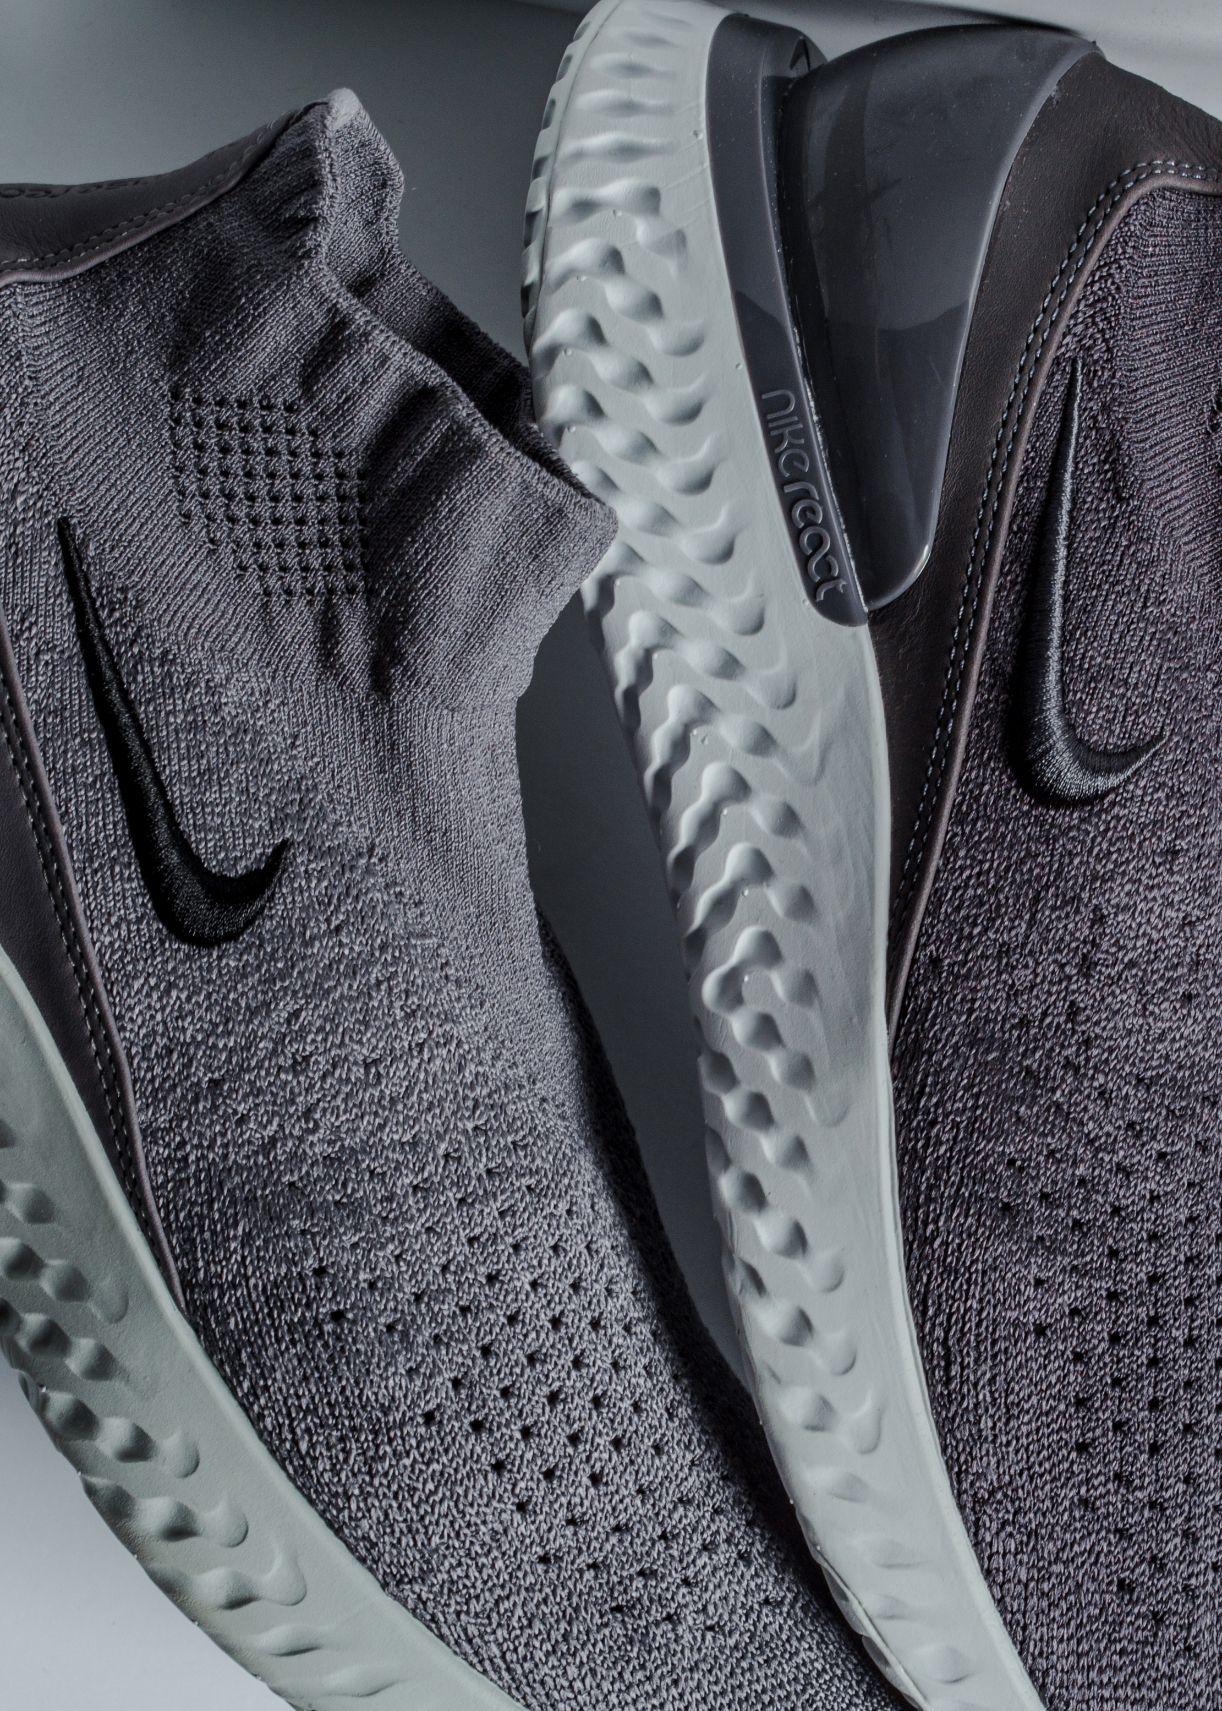 Nike Rise React Flyknit Nike Shoes Nike Flyknit